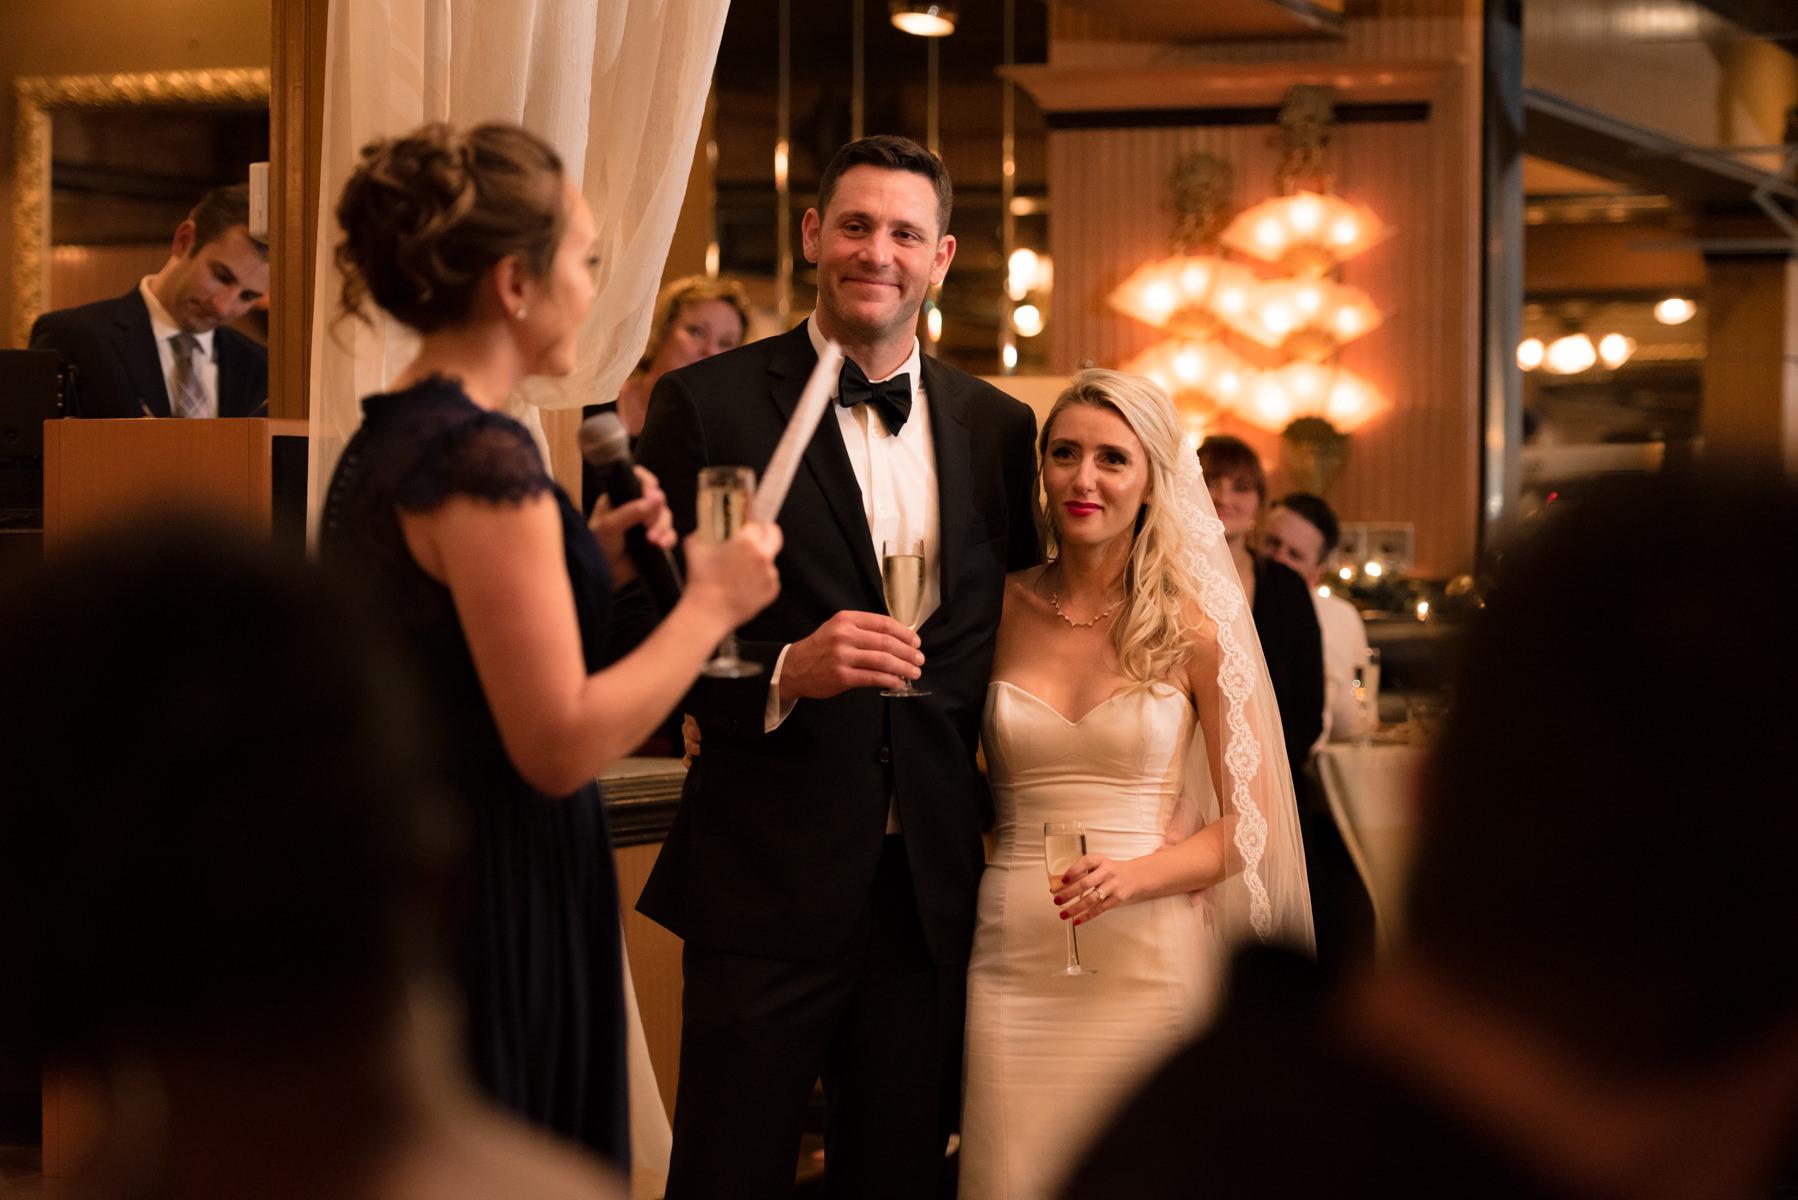 Andrew Tat - Documentary Wedding Photography - Lake Union Cafe - Seattle, Washington -Rachel and Ryan - 38.jpg